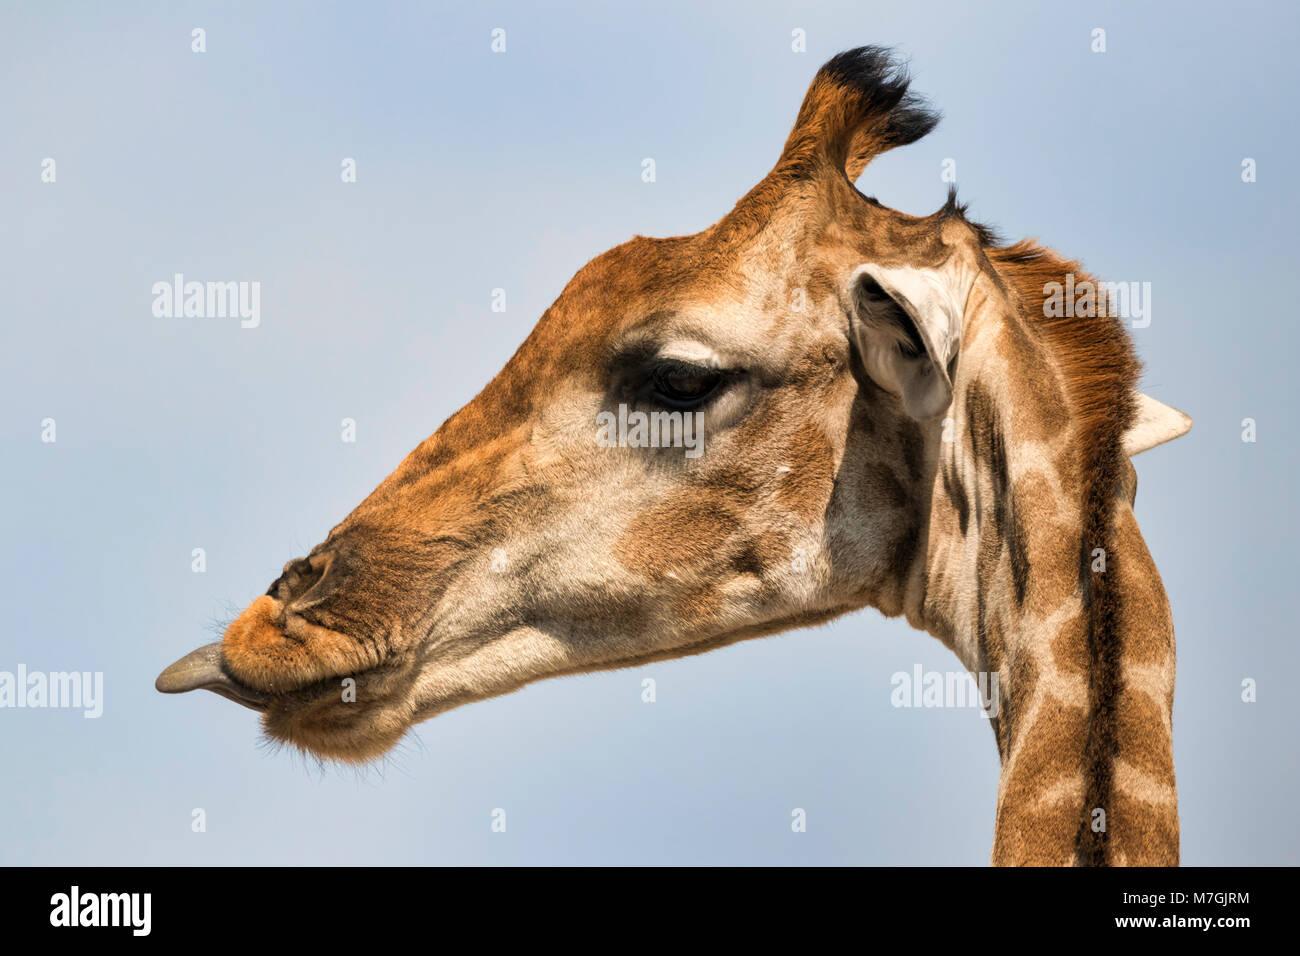 Giraffe tongue - Stock Image